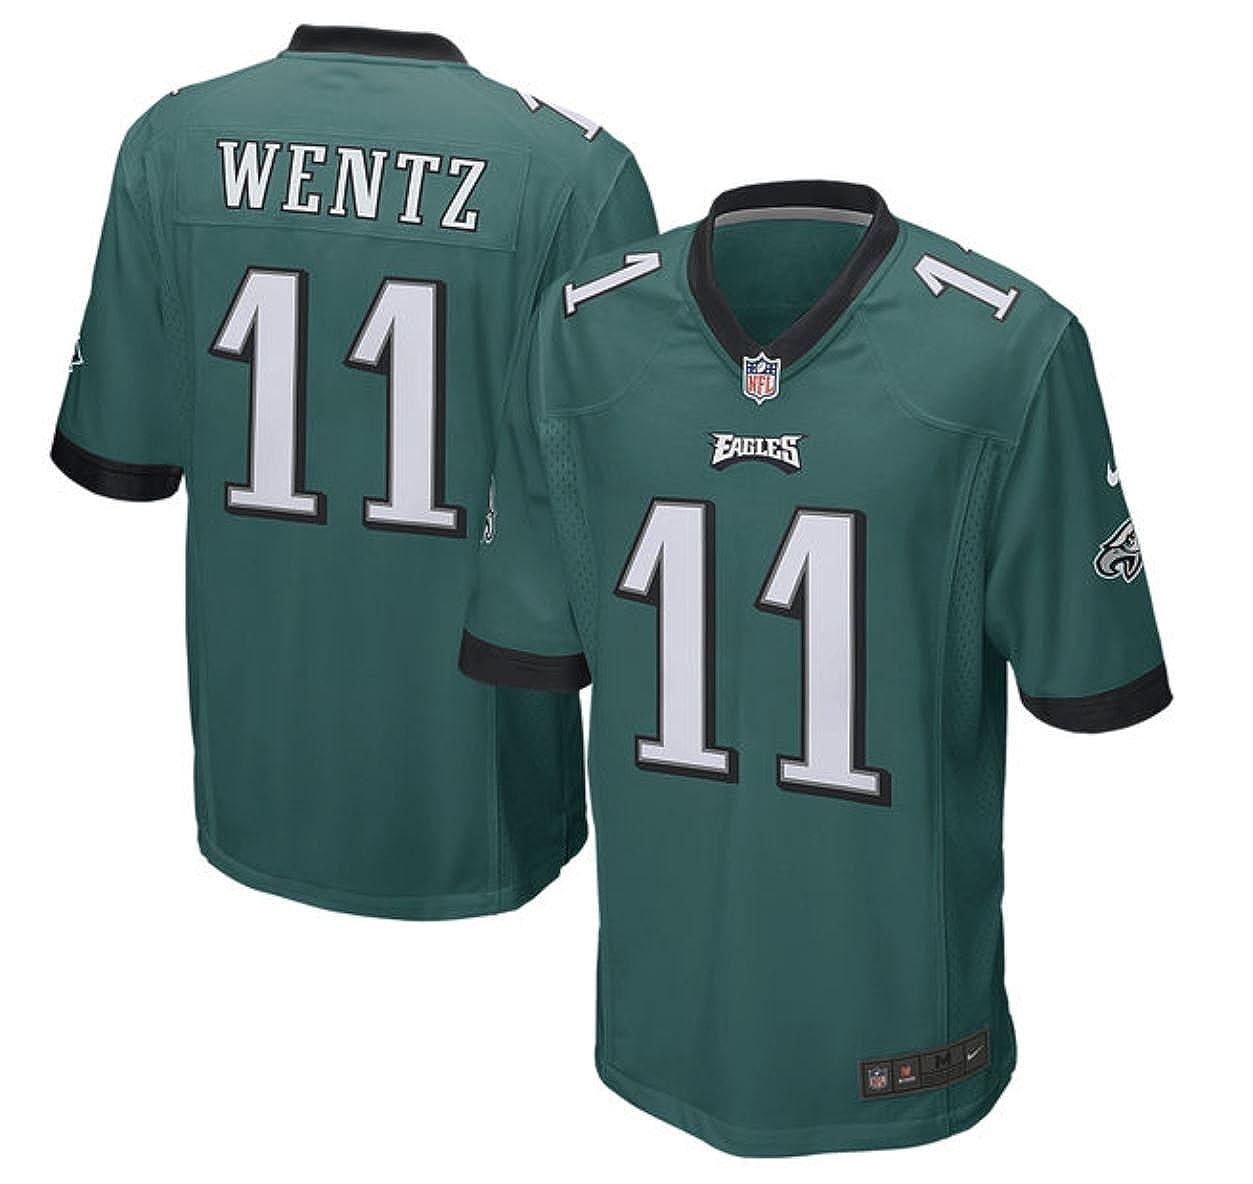 1a747289587 Amazon.com: Carson Wentz Philadelphia Eagles Youth Nike Green Game Jersey ( Youth Sizes): Sports & Outdoors